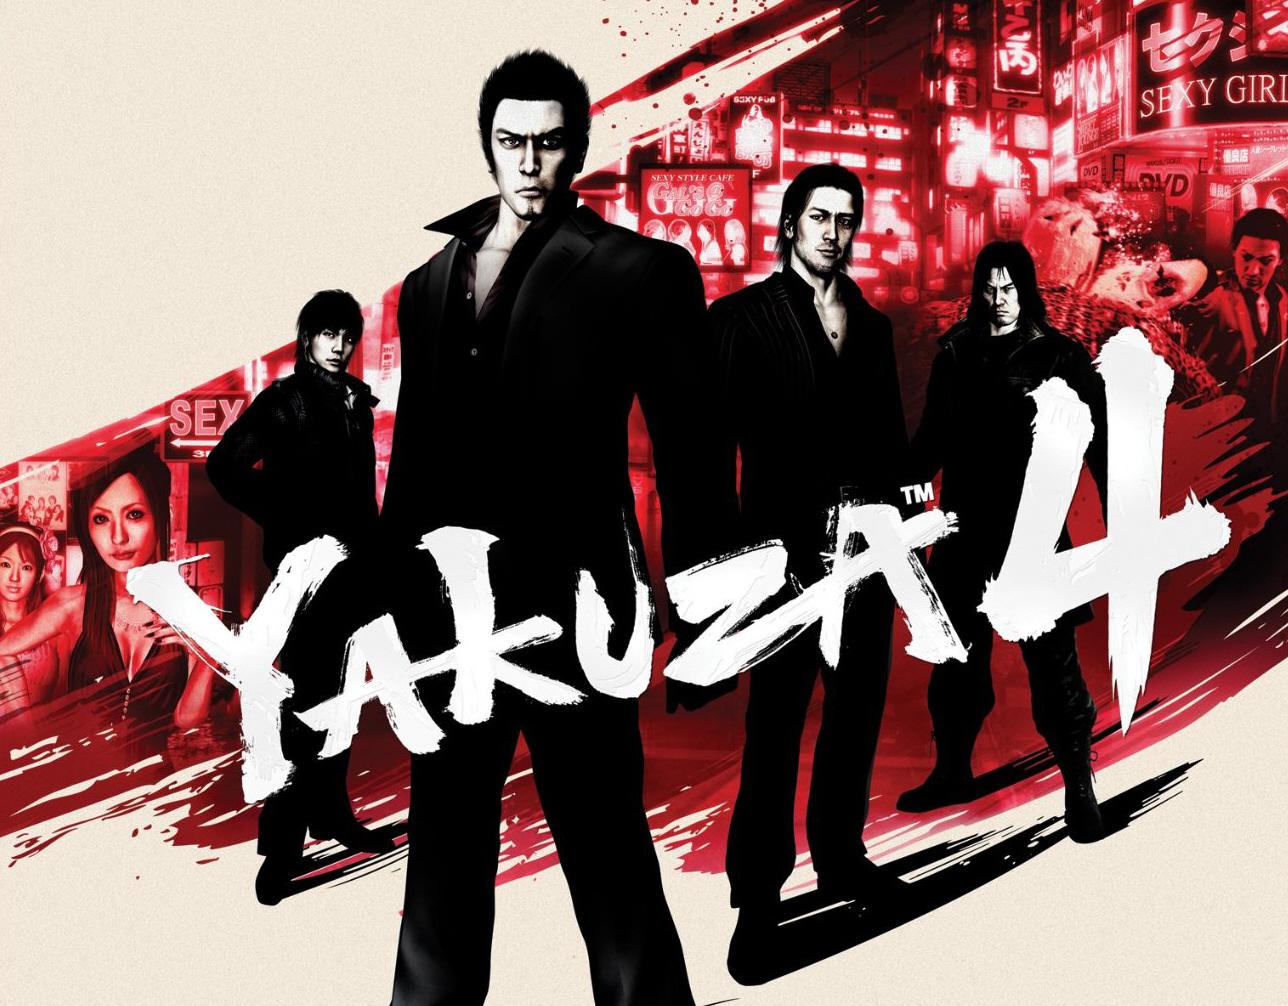 yakuza 4 walkthrough video guide ps3. Black Bedroom Furniture Sets. Home Design Ideas